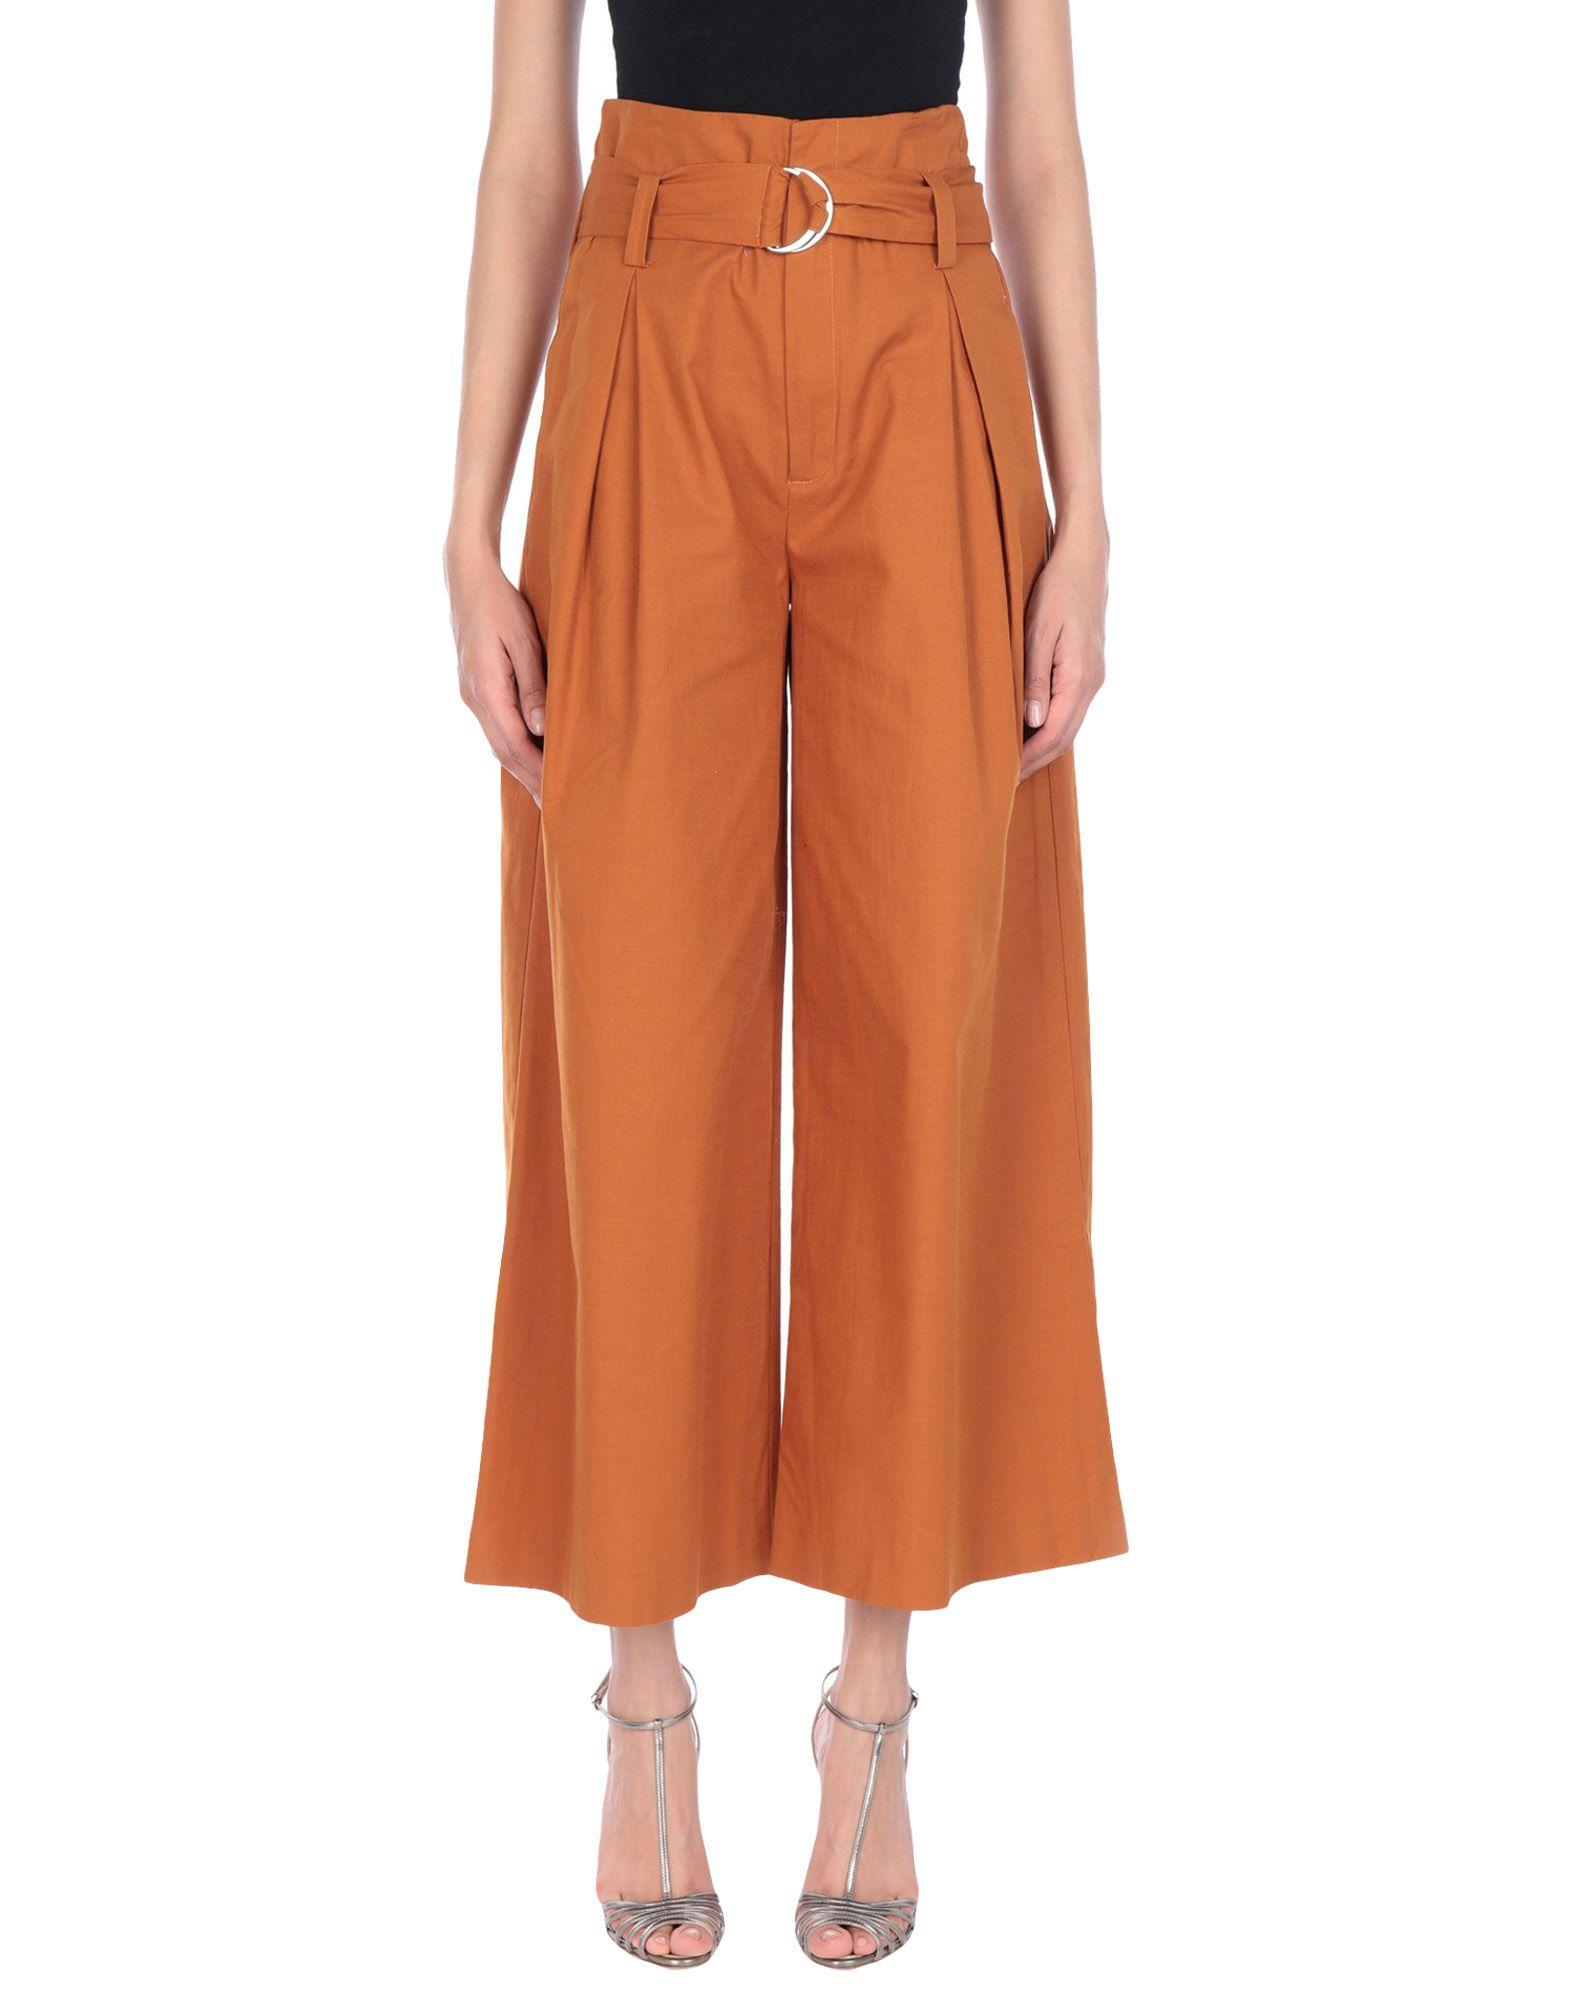 5PREVIEW Повседневные брюки original new arrival 2017 puma evostripe ultimate fz hoody men s jacket hooded sportswear